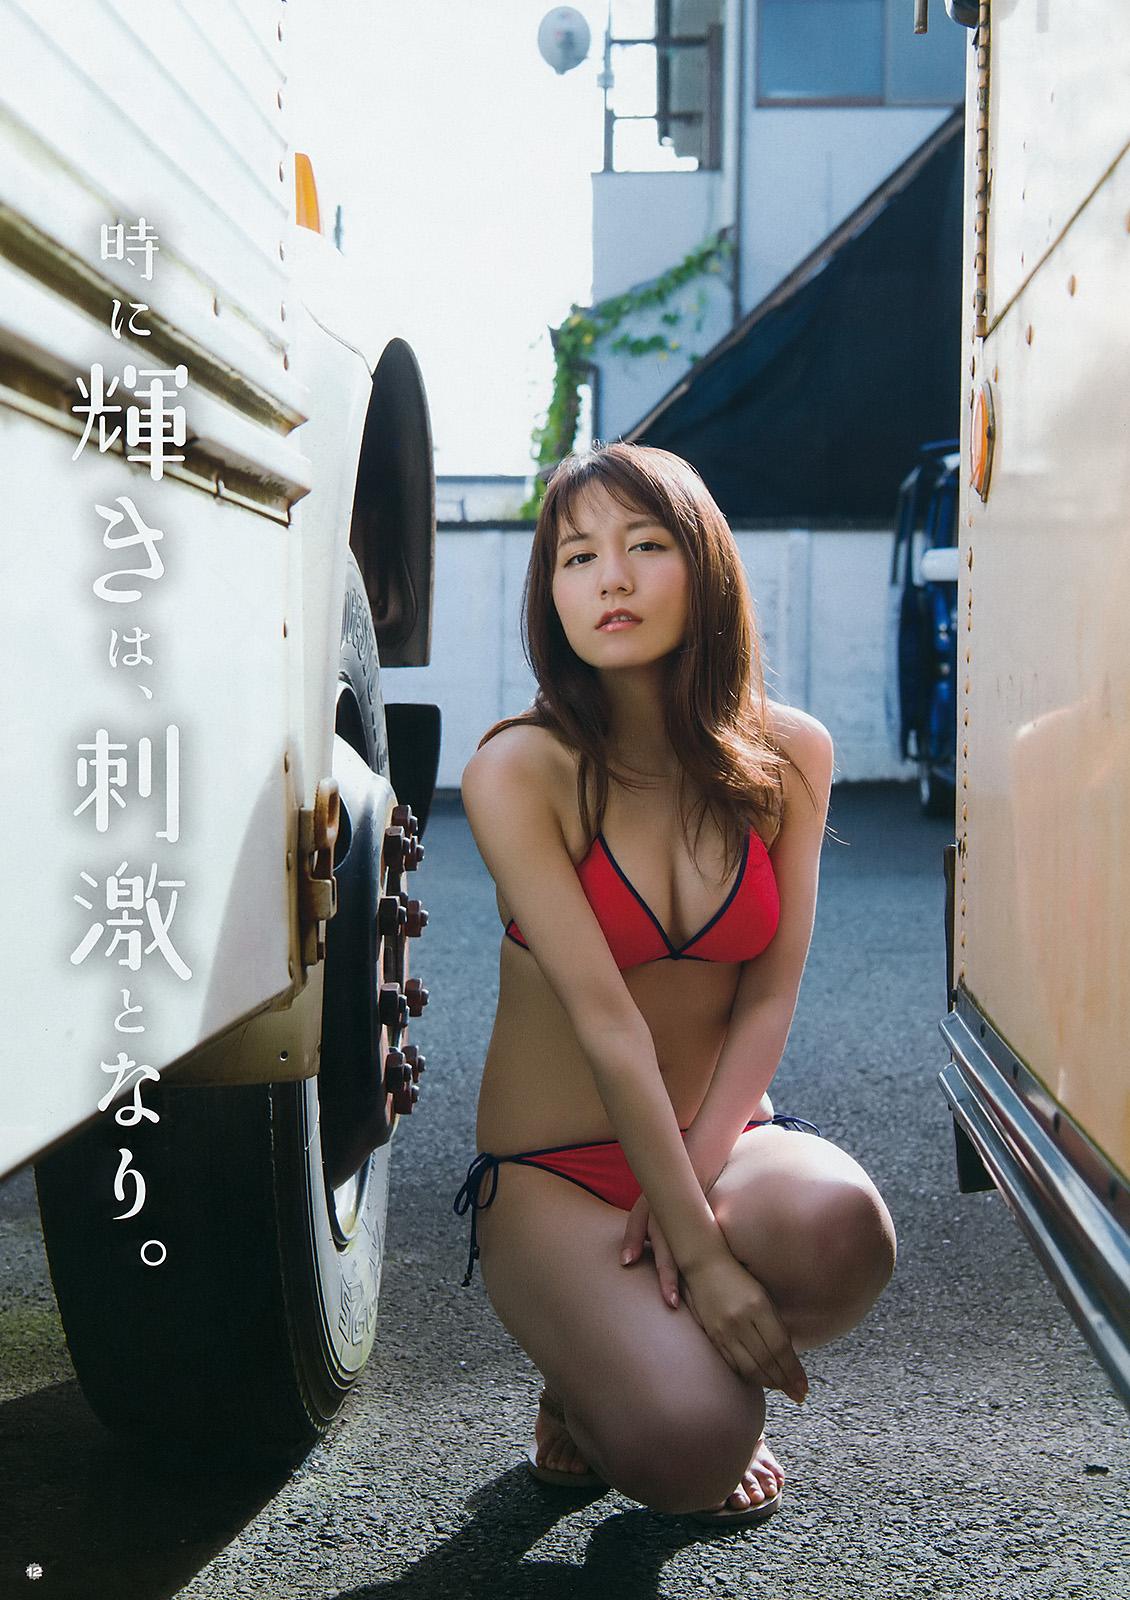 Oba Mina 大場美奈 SKE48, Young Gangan 2016.10.21 (ヤングガンガン 2016年No.21) Part03